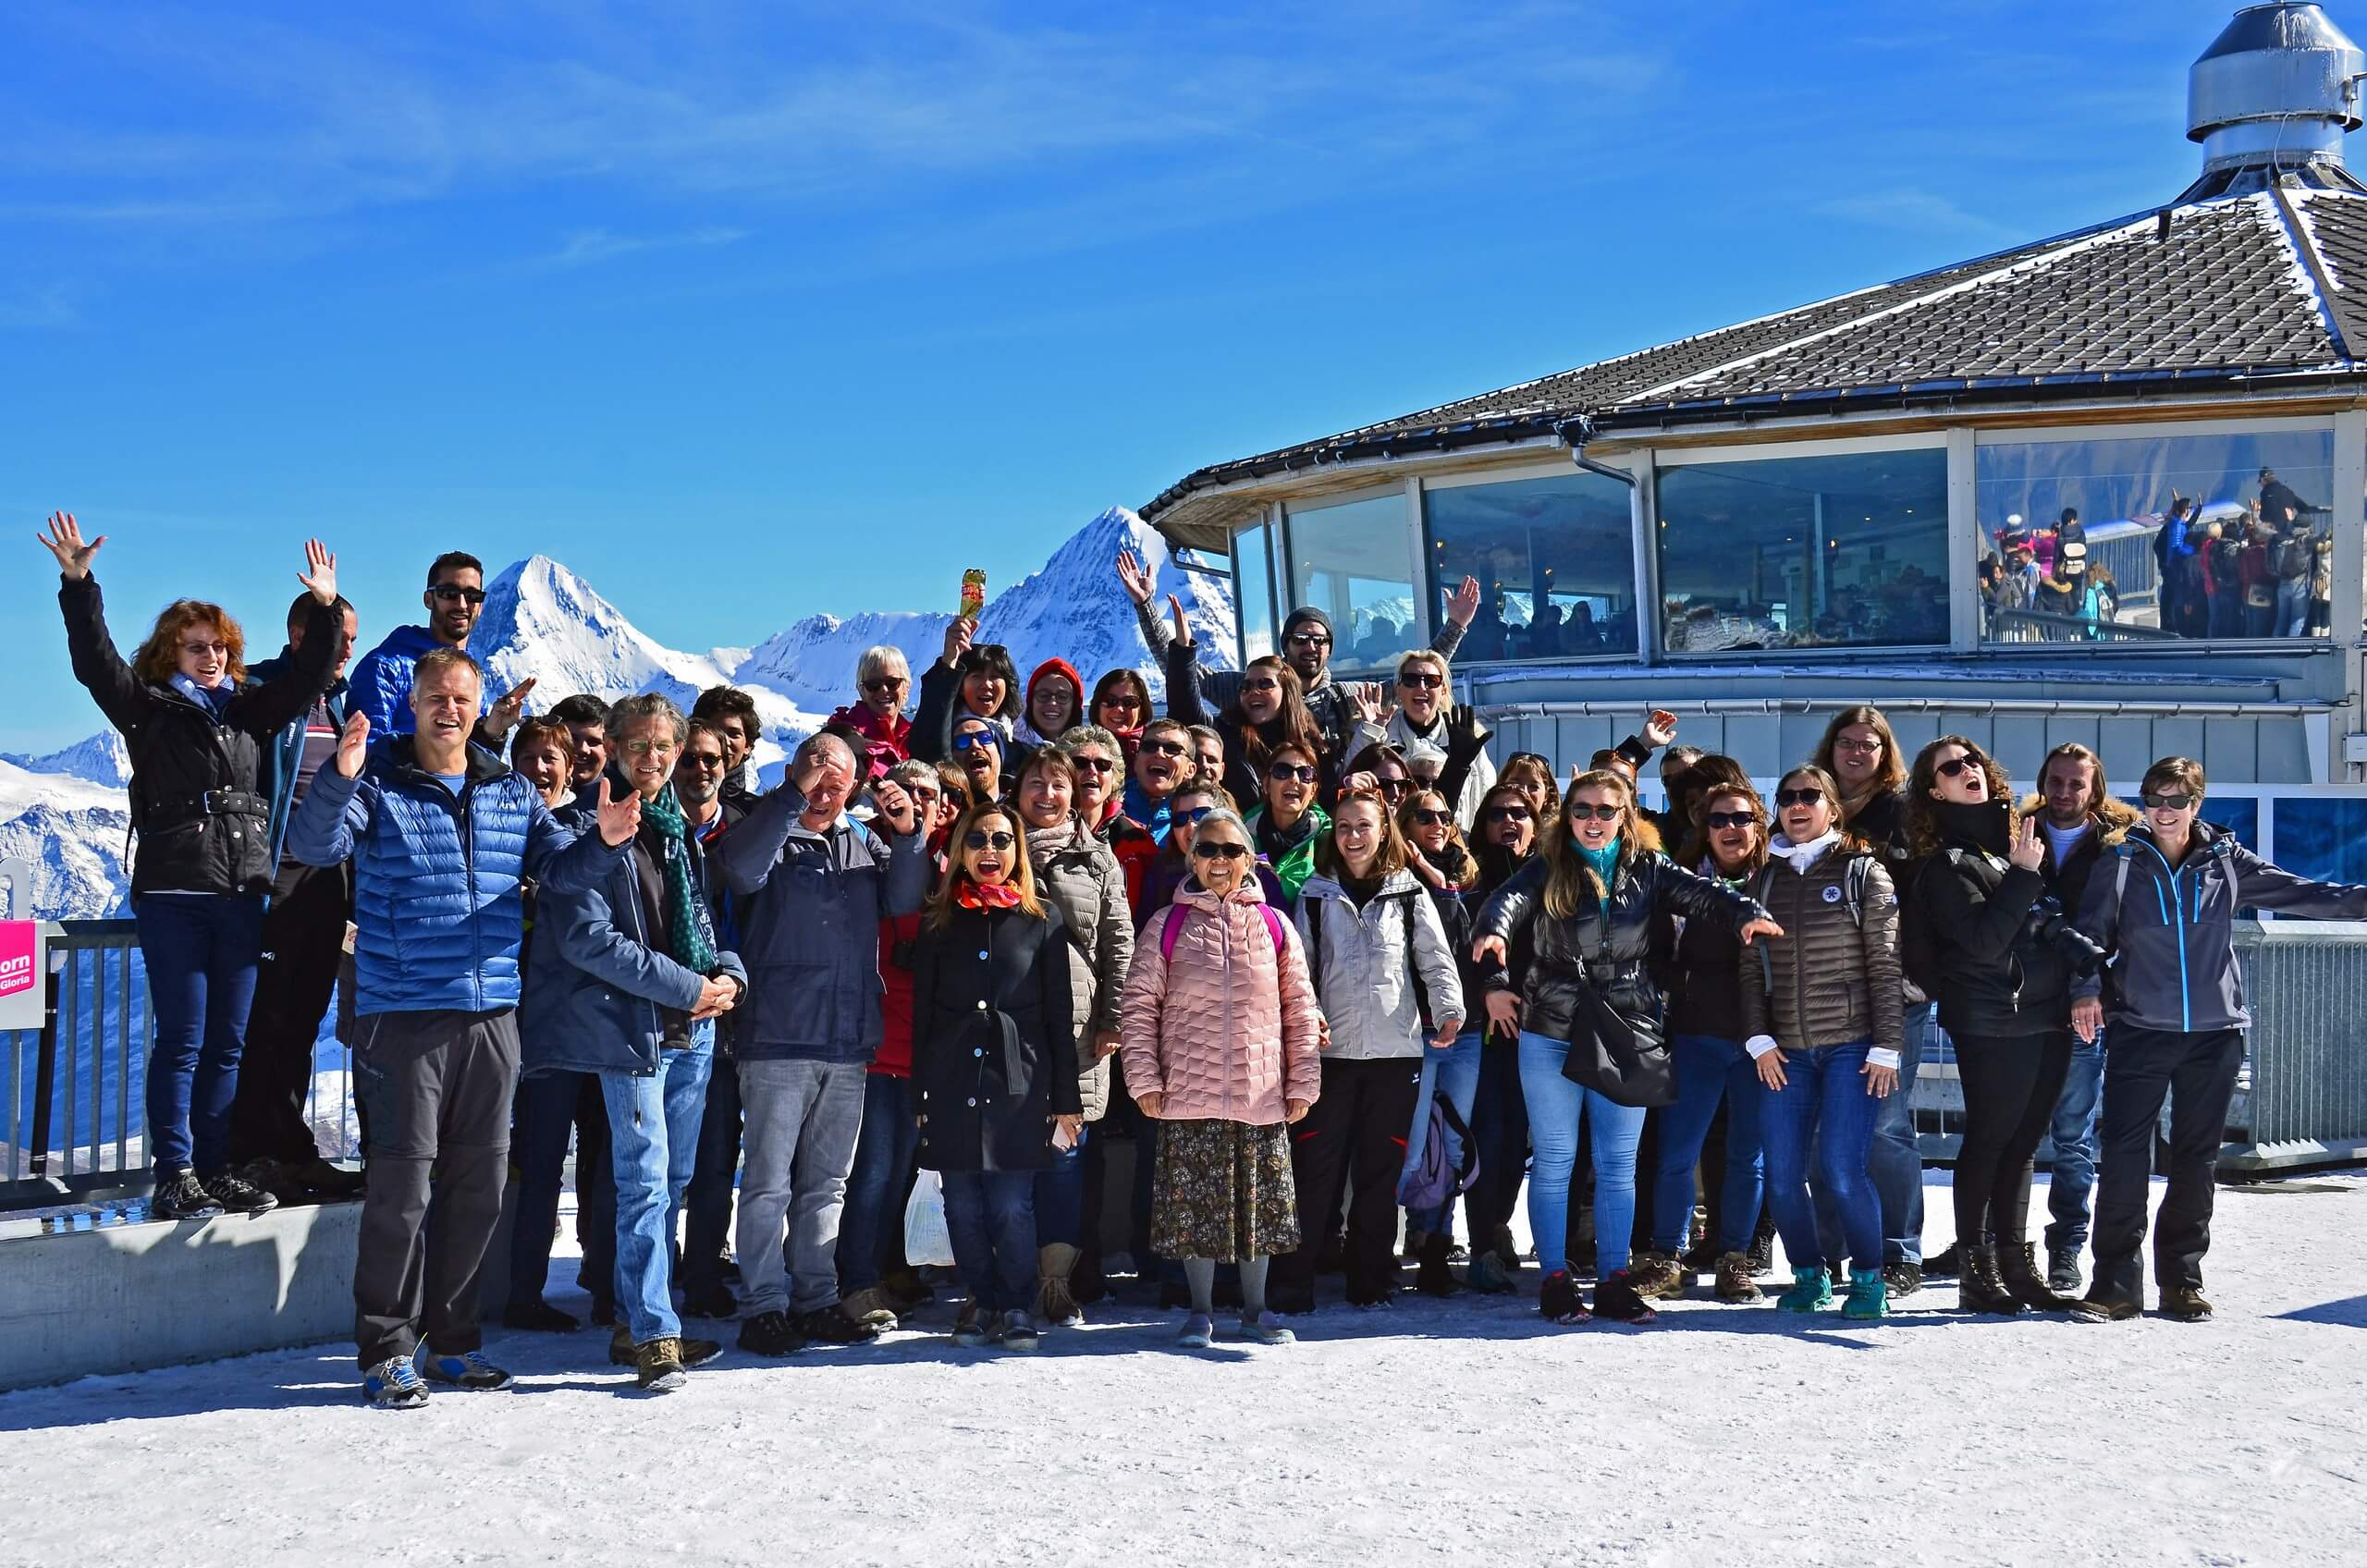 jungfrau-tours-schilthorn